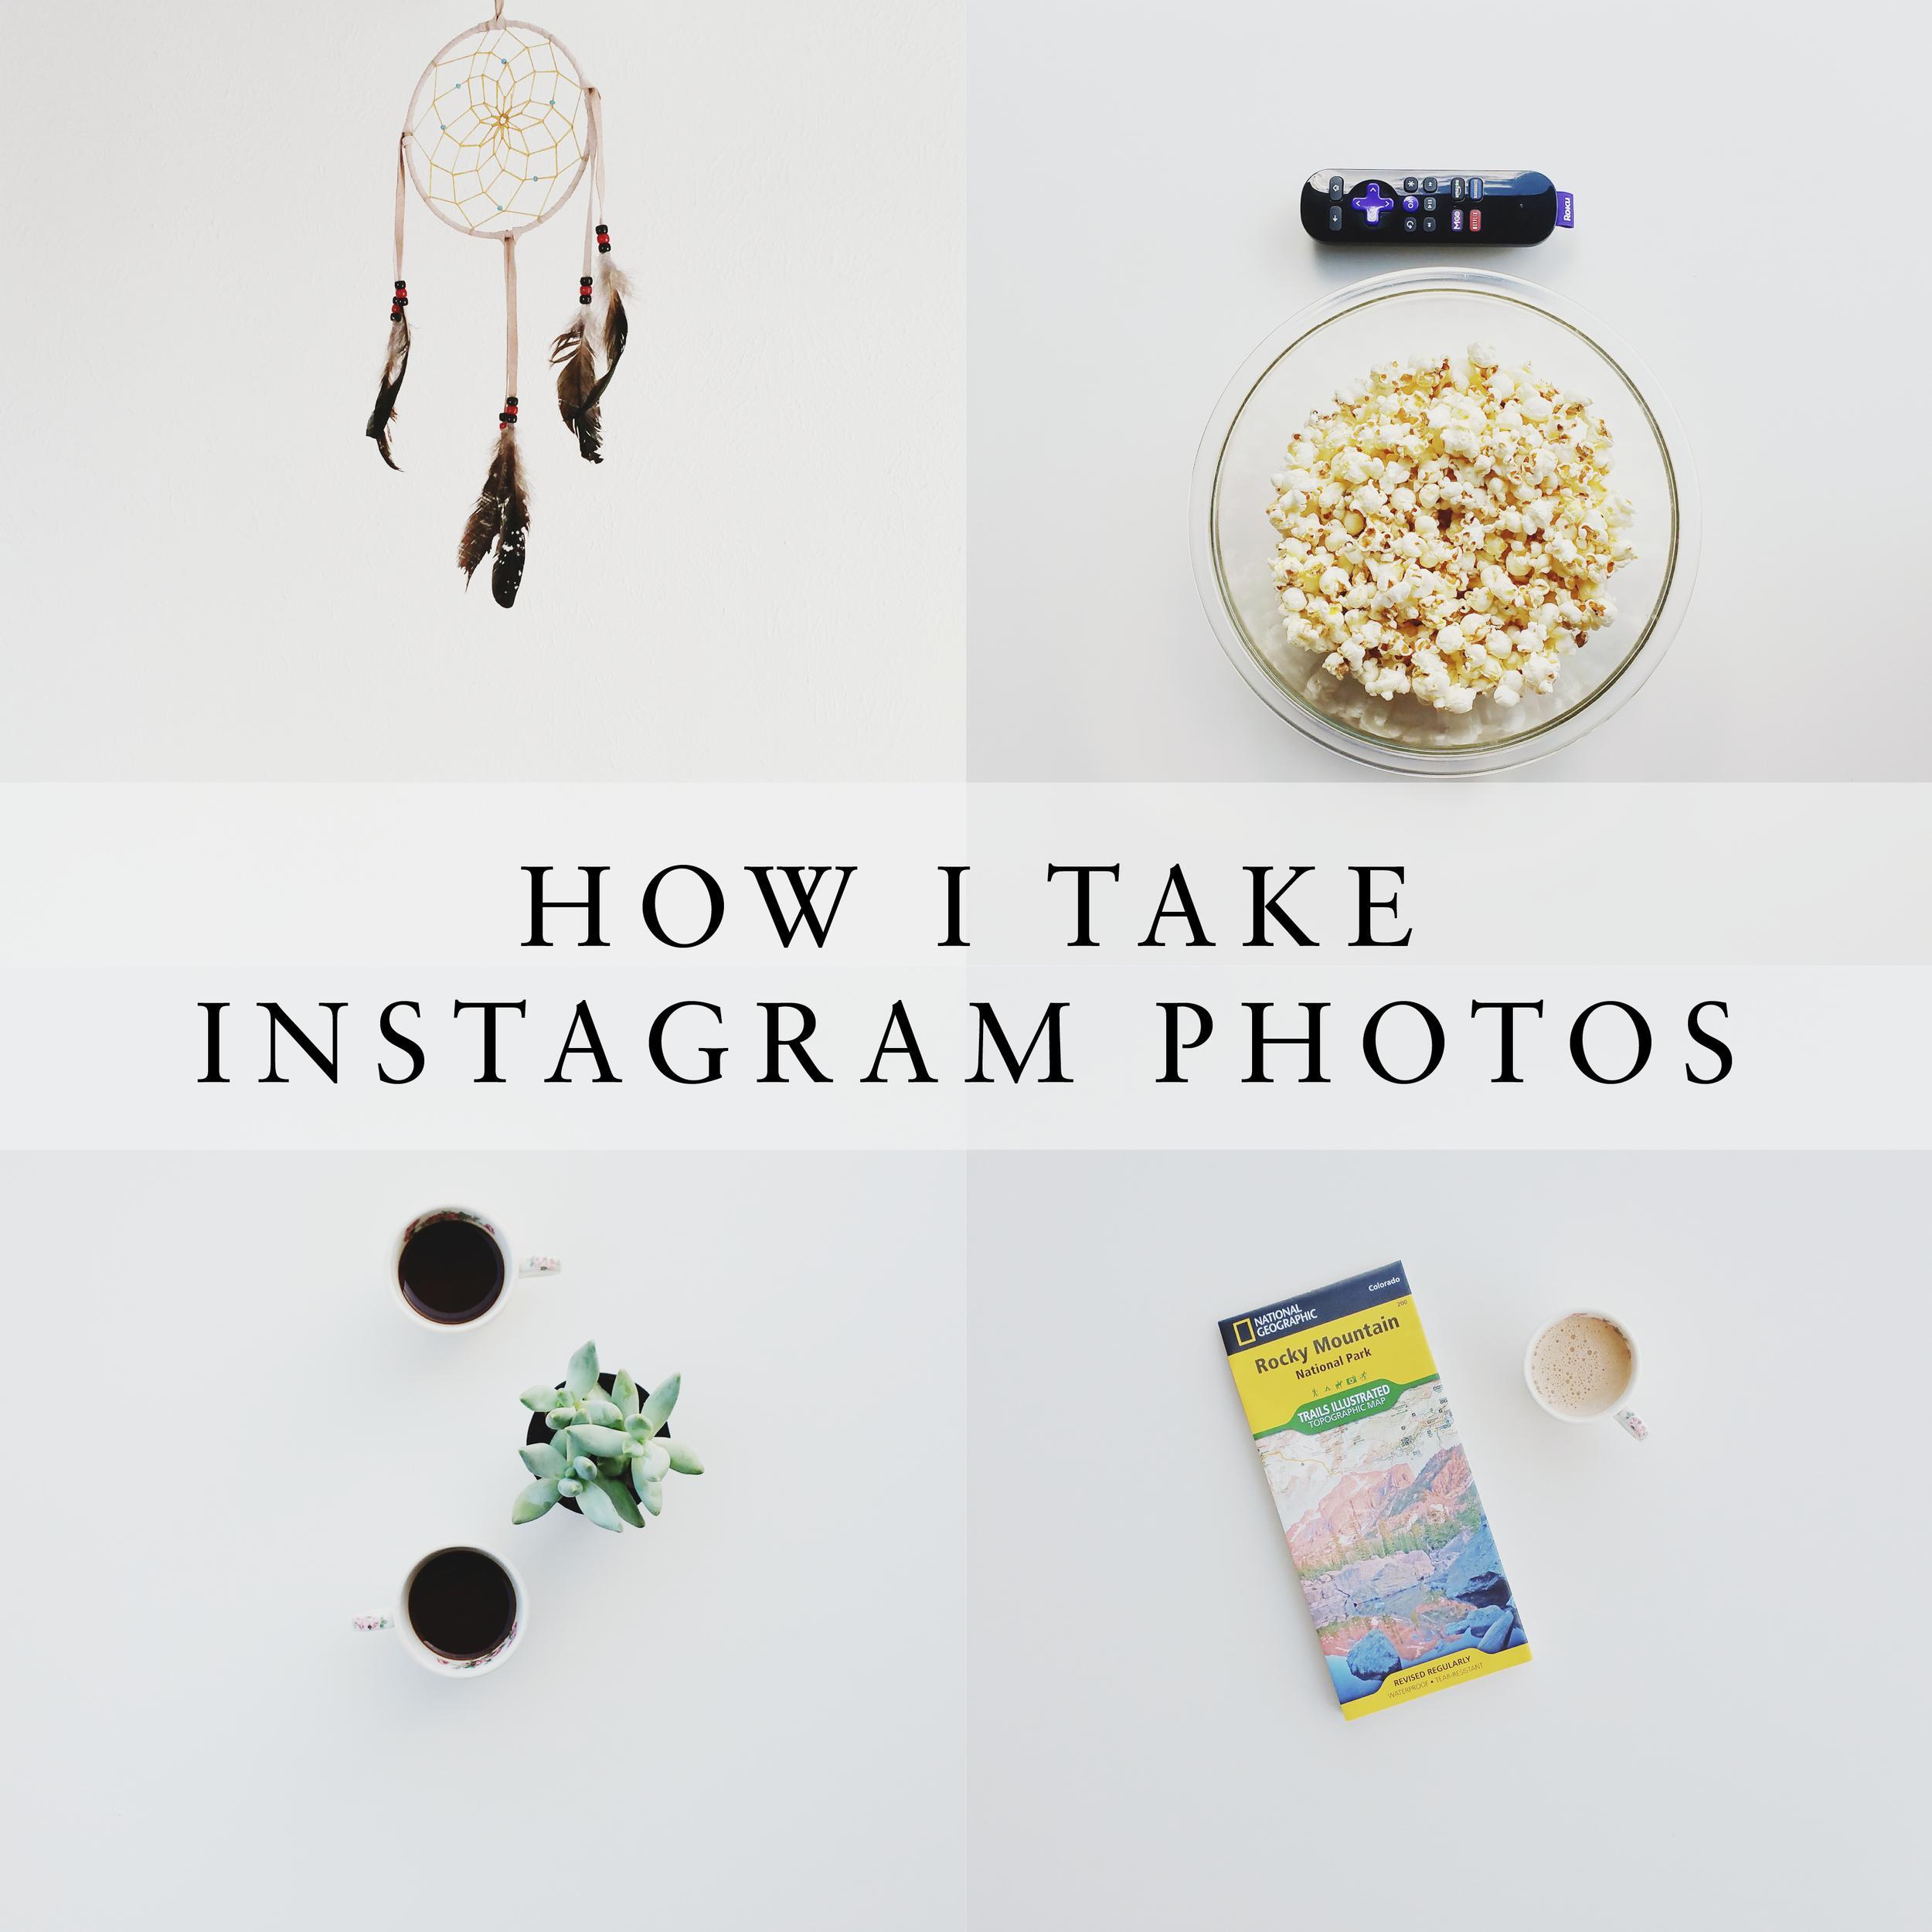 How to take better instagram photos by Emily Sacco www.emilysacco.com